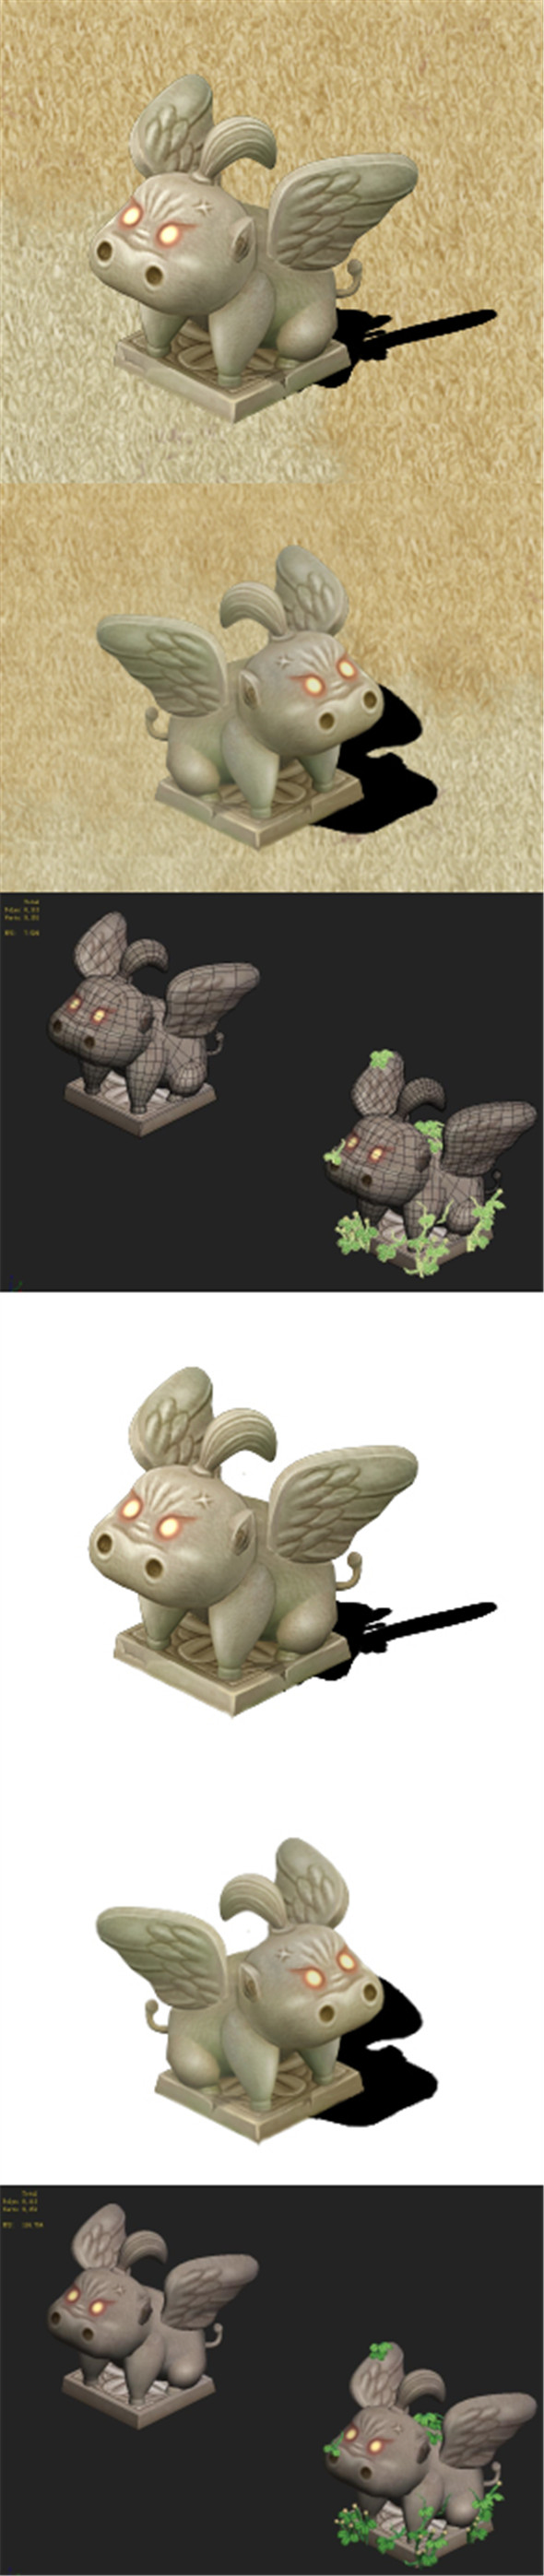 Cartoon version - Fog magic Obediently beast - 3DOcean Item for Sale